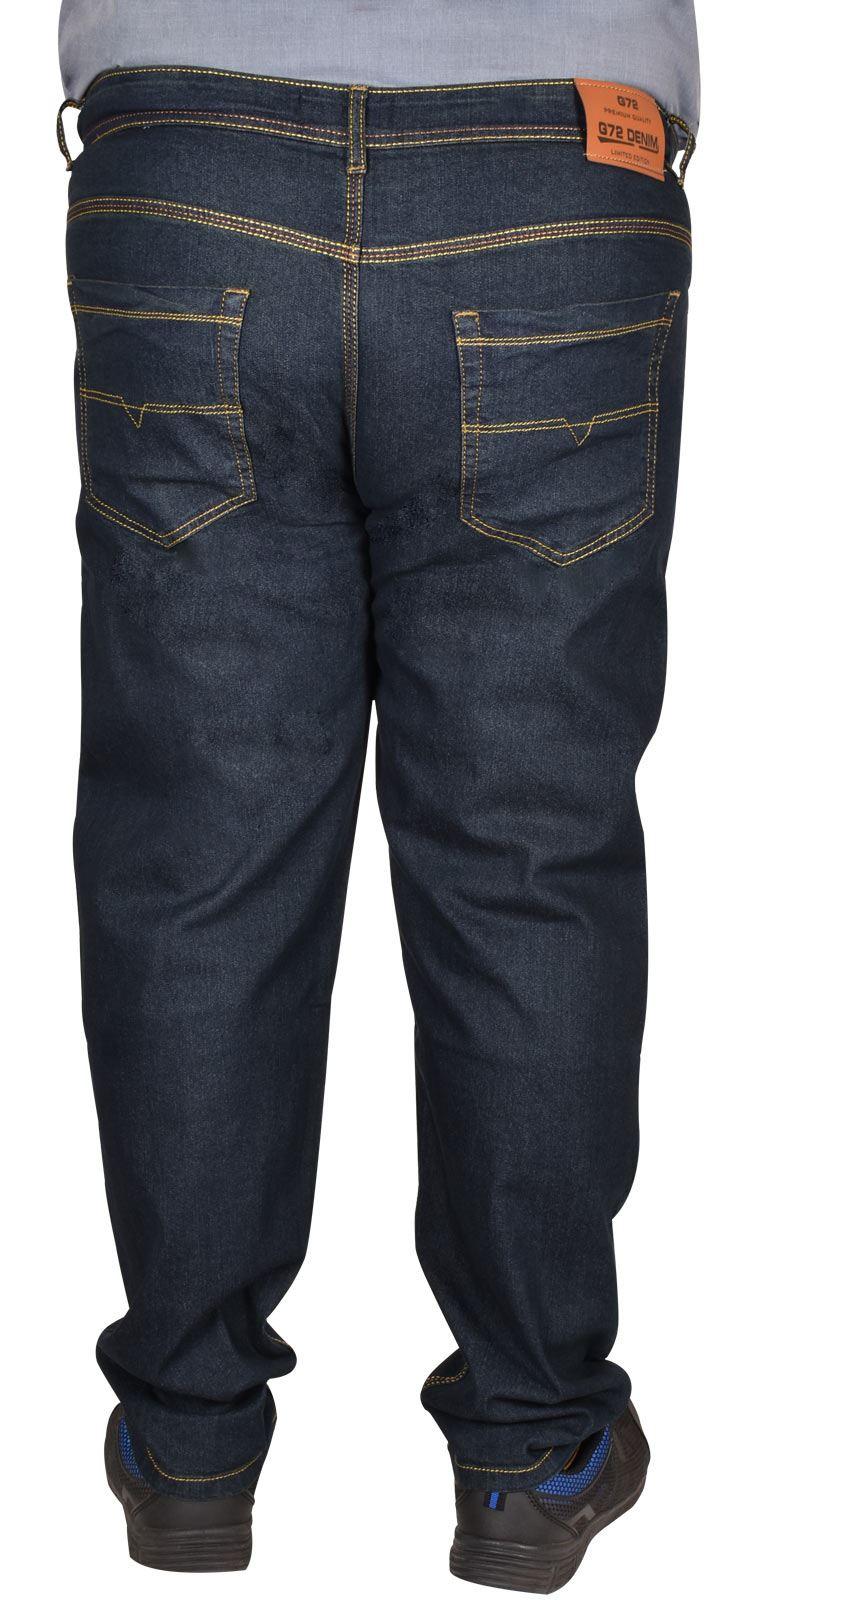 Men-Jeans-Straight-Leg-Stretch-Denim-Trouser-Pants-All-Waist-Big-Tall-King-Sizes thumbnail 7